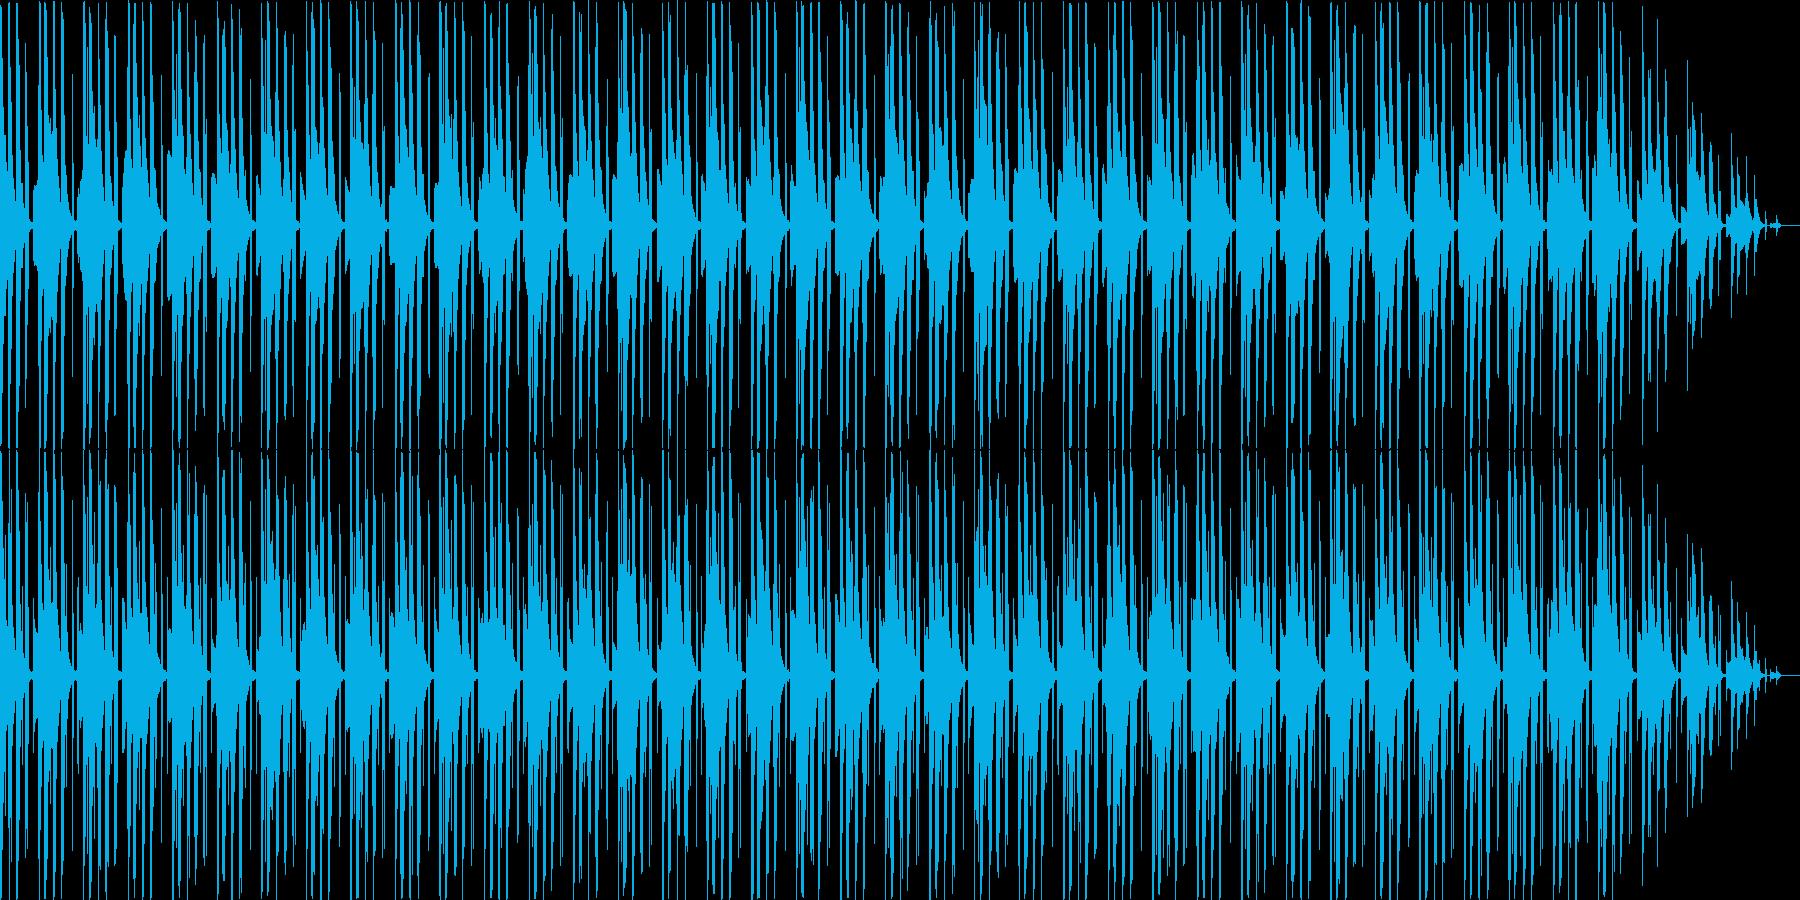 VP・日常シーンに 少しコミカルなテクノの再生済みの波形